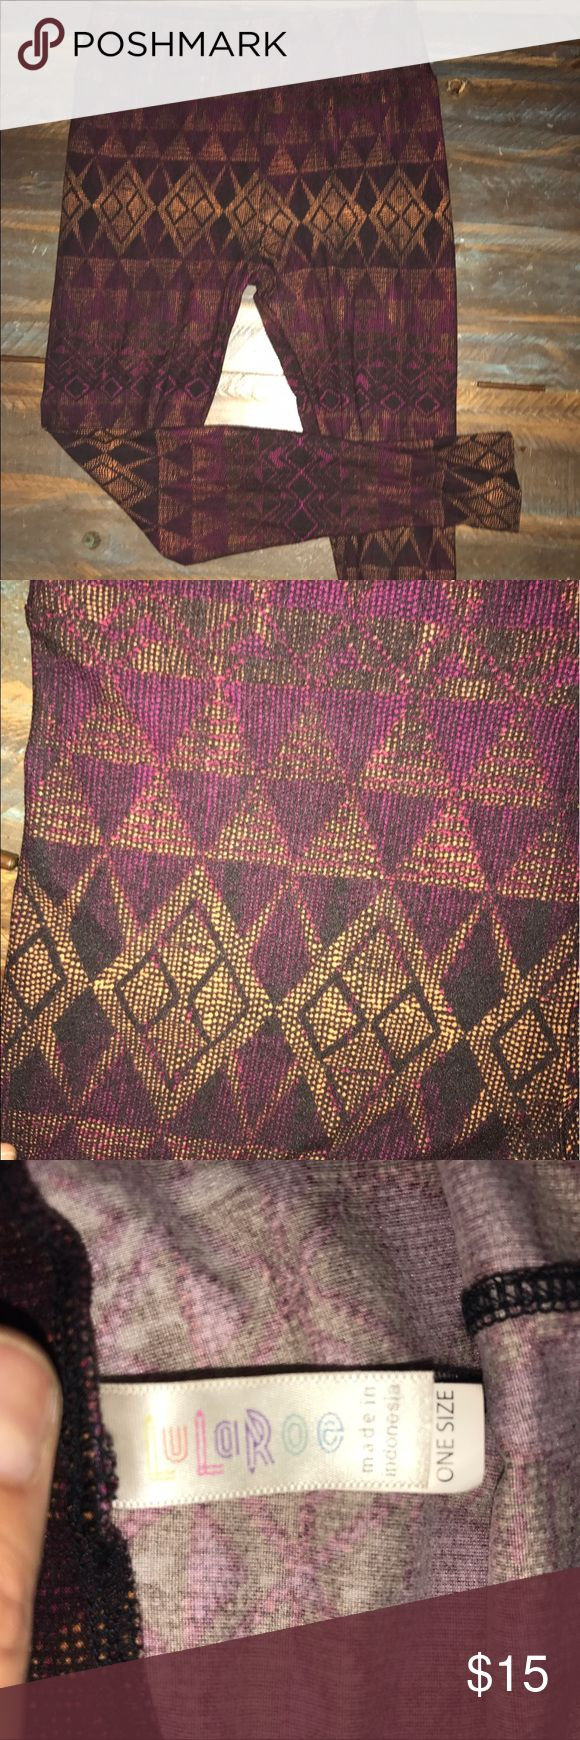 LulaRoe one size Aztec Print leggings Worn and washed once. No flaws. Beautiful shades of purple/burgundy/mustard/black. LuLaRoe Pants Leggings